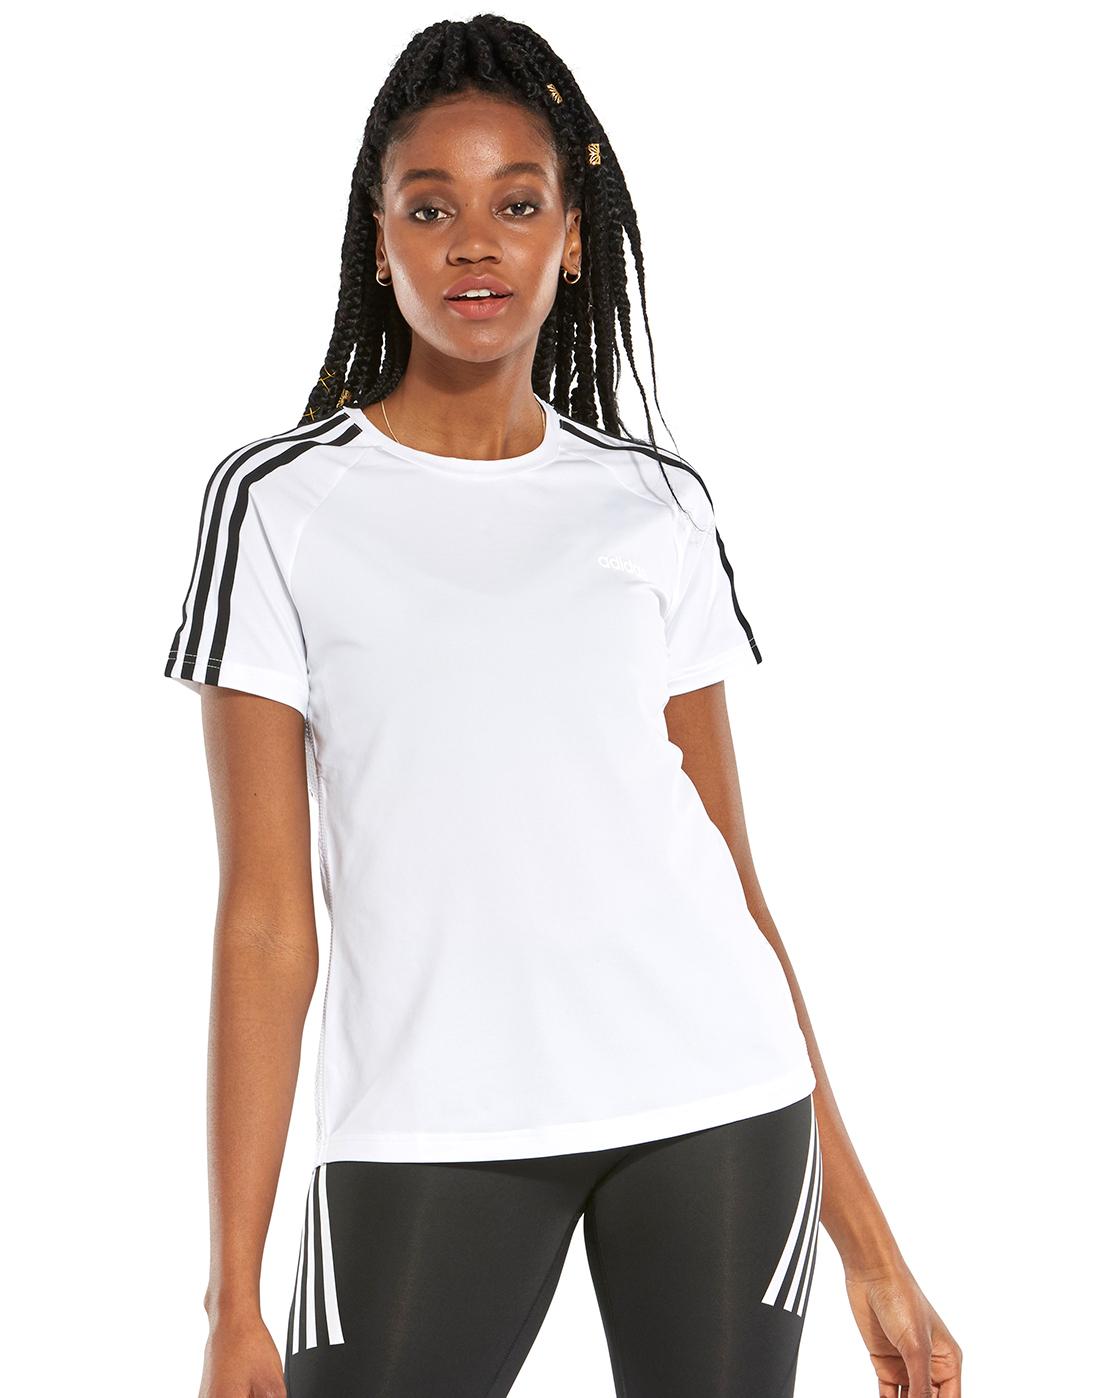 ba17250885a68 Women's White & Black adidas Gym T-Shirt | Life Style Sports